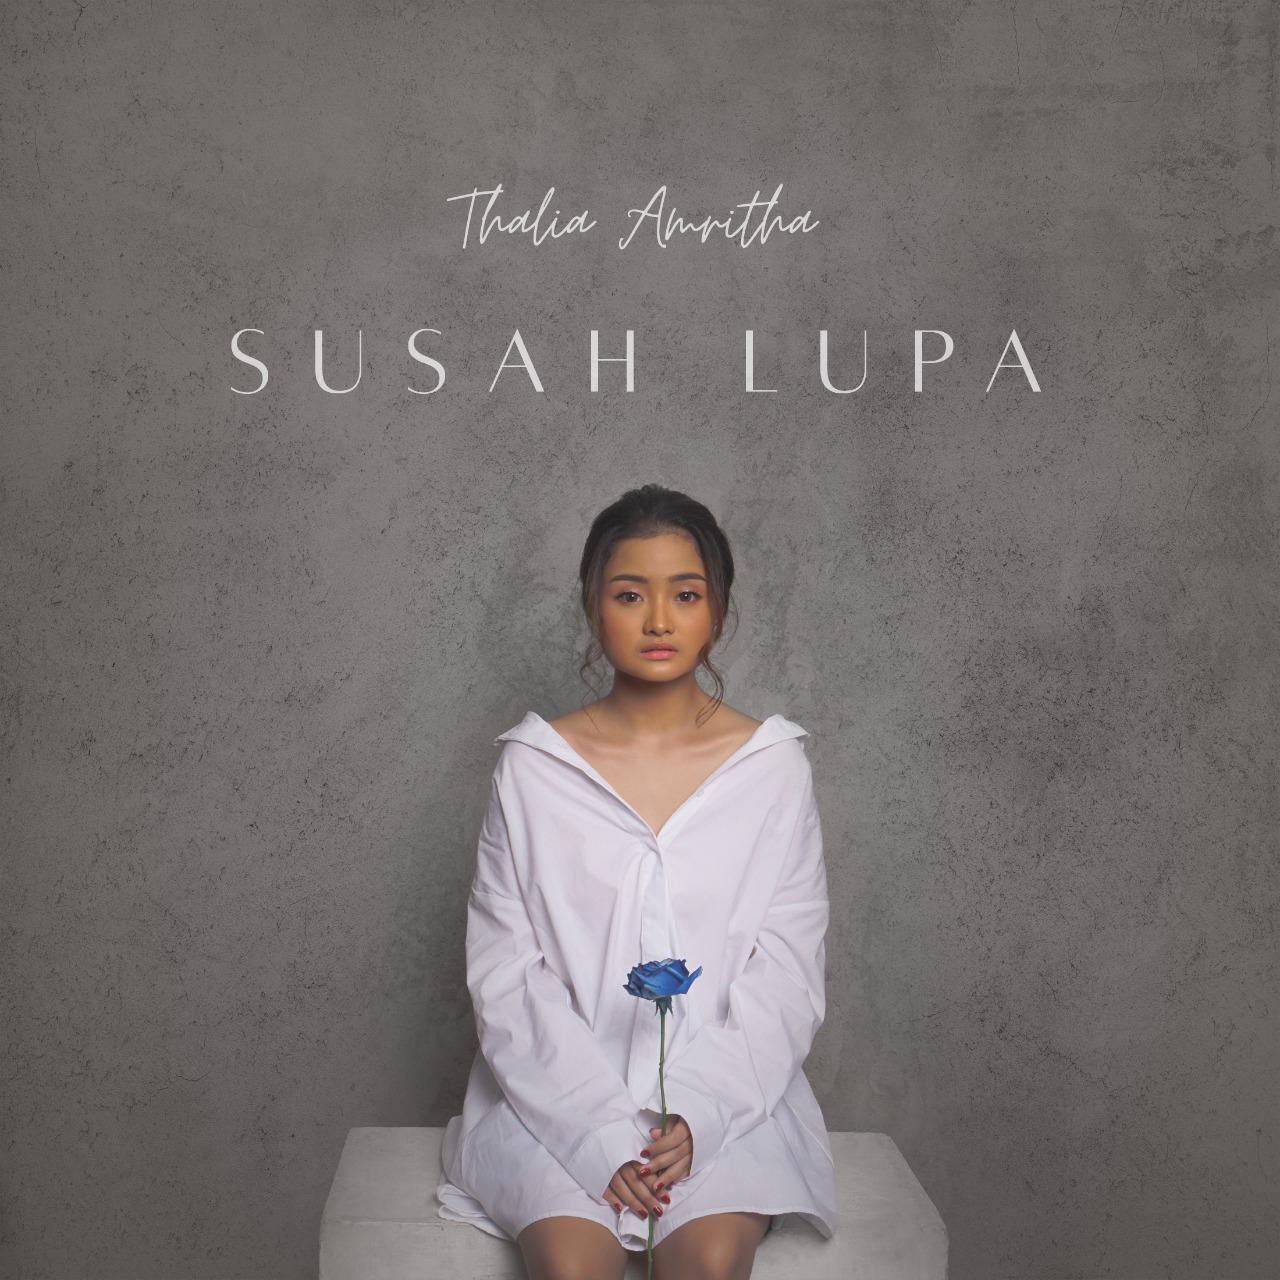 Kolaborasi Thalia Amritha bersama Pika Iskandar di single : 'Susah Lupa'